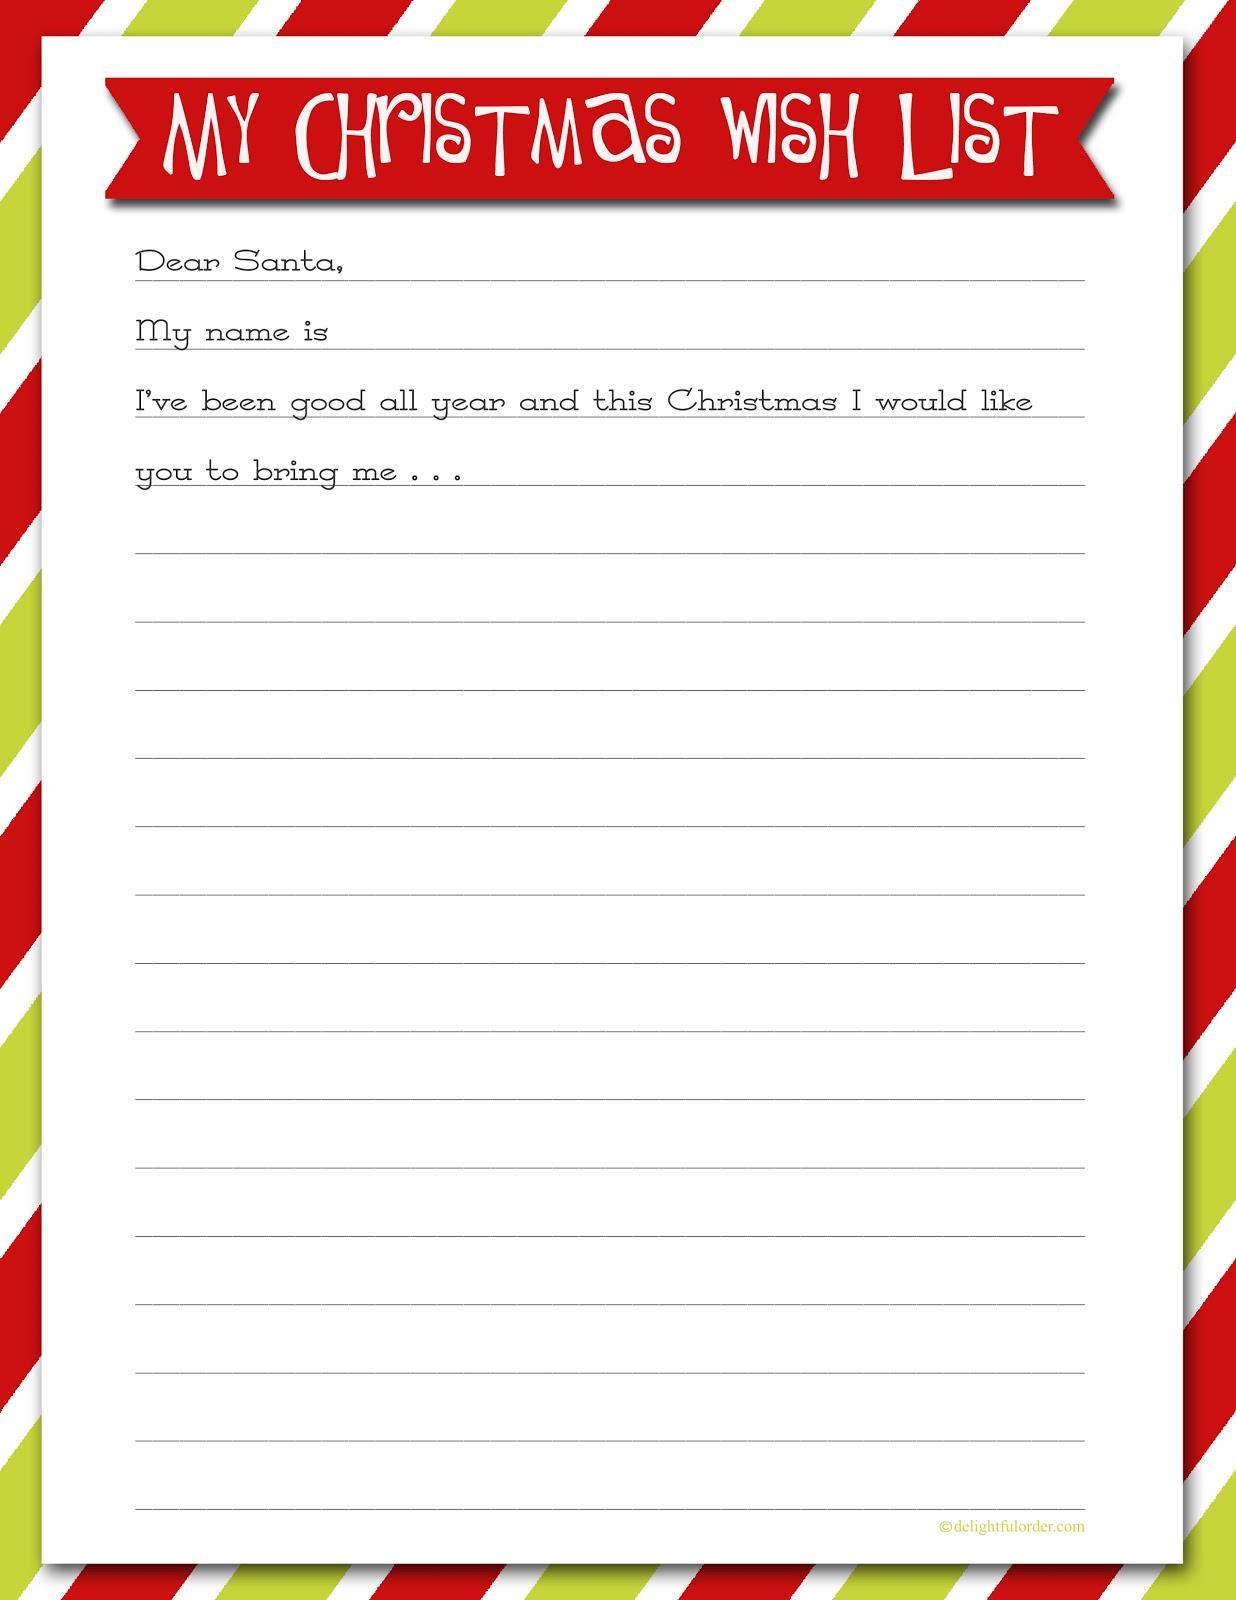 Kids Christmas List Template - Coloring Home